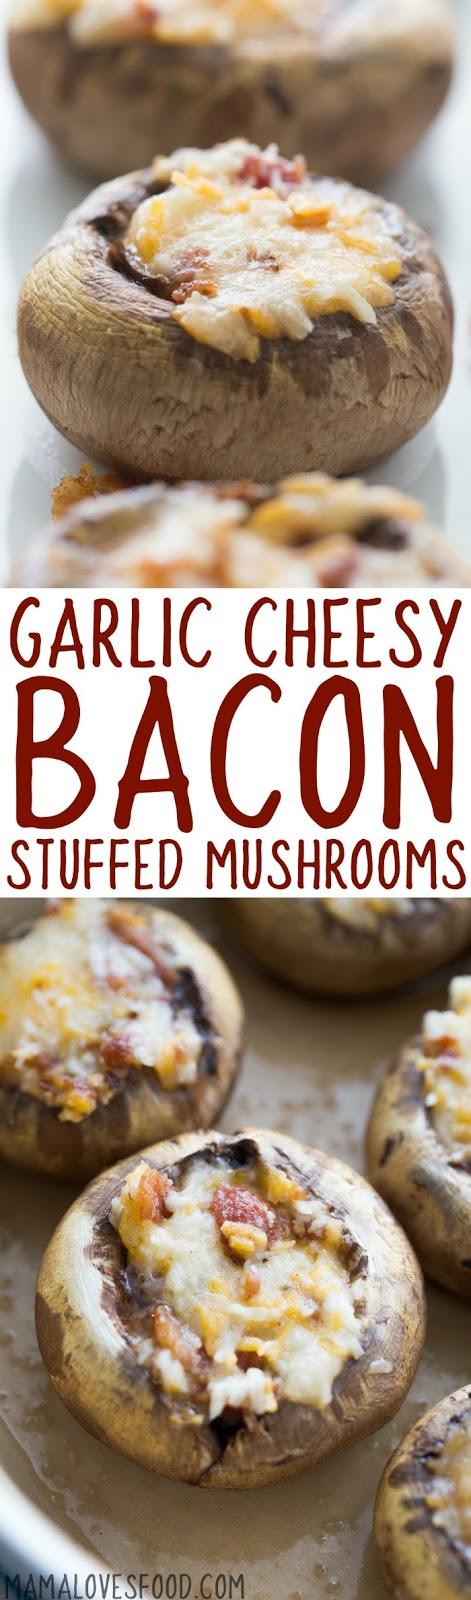 stuffed mushrooms recipe easy